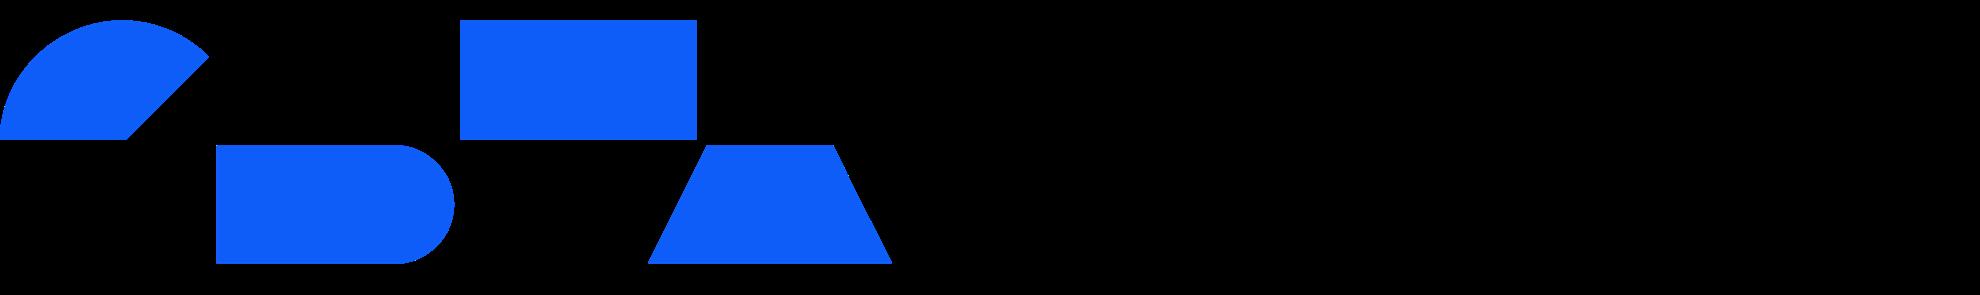 CSTA North Country New York logo